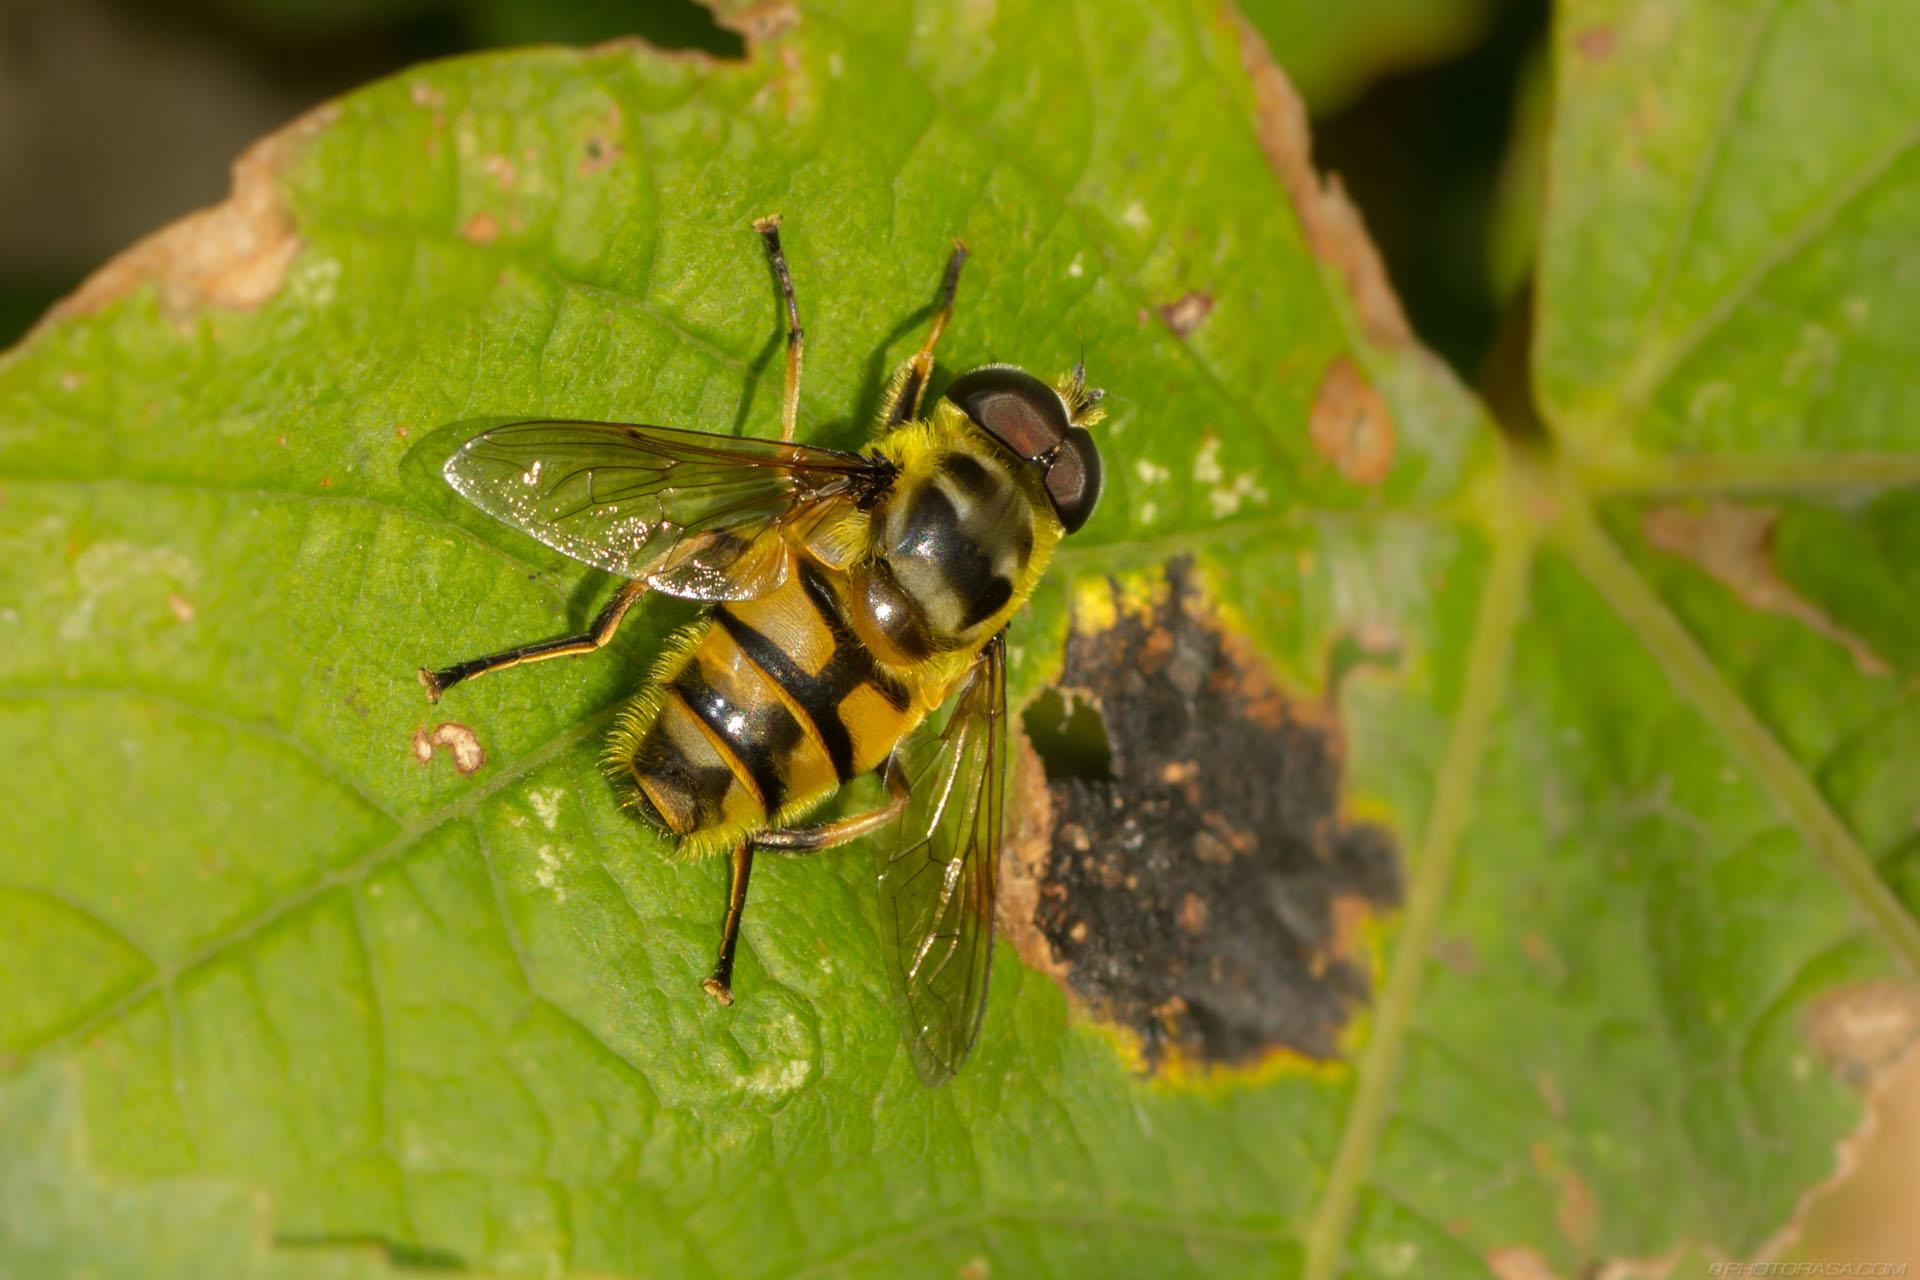 https://photorasa.com/hoverflies/myathropa-florea-hoverfly/